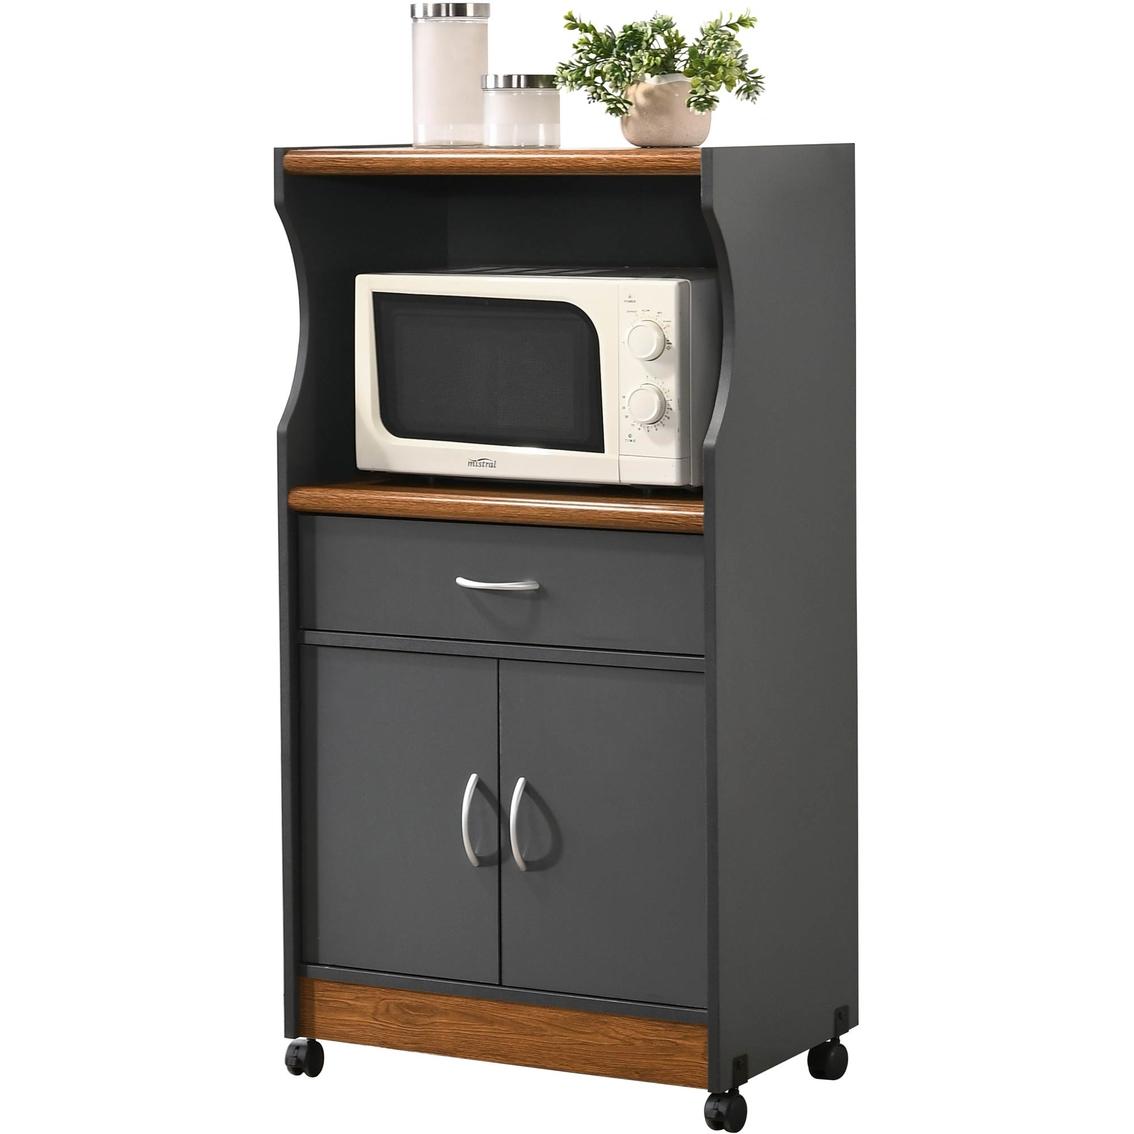 Hodedah Microwave Kitchen Cart | Kitchen Carts & Islands ...